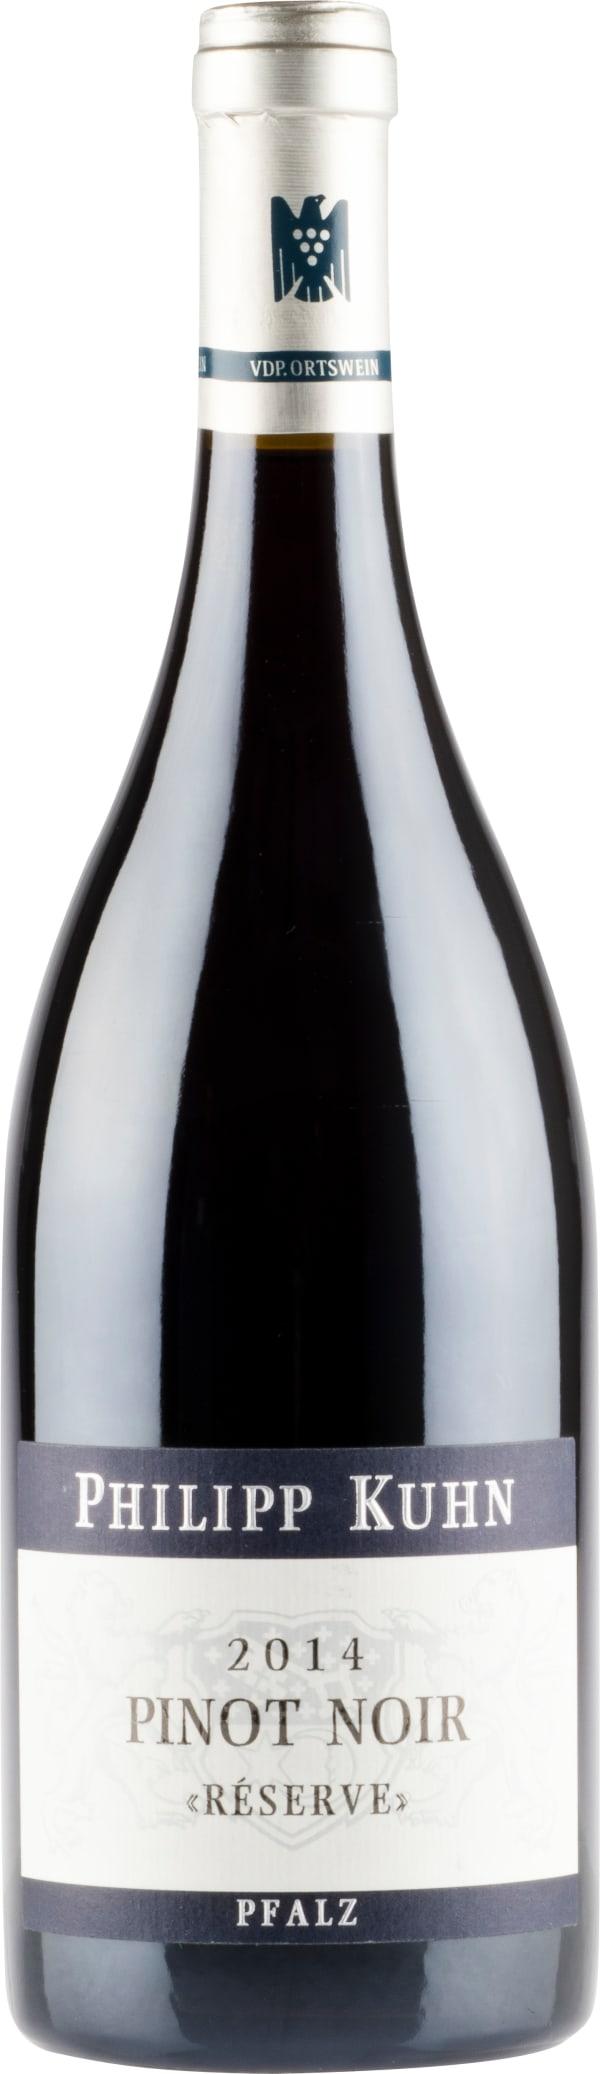 Philipp Kuhn Pinot Noir Laumersheimer Réserve 2015